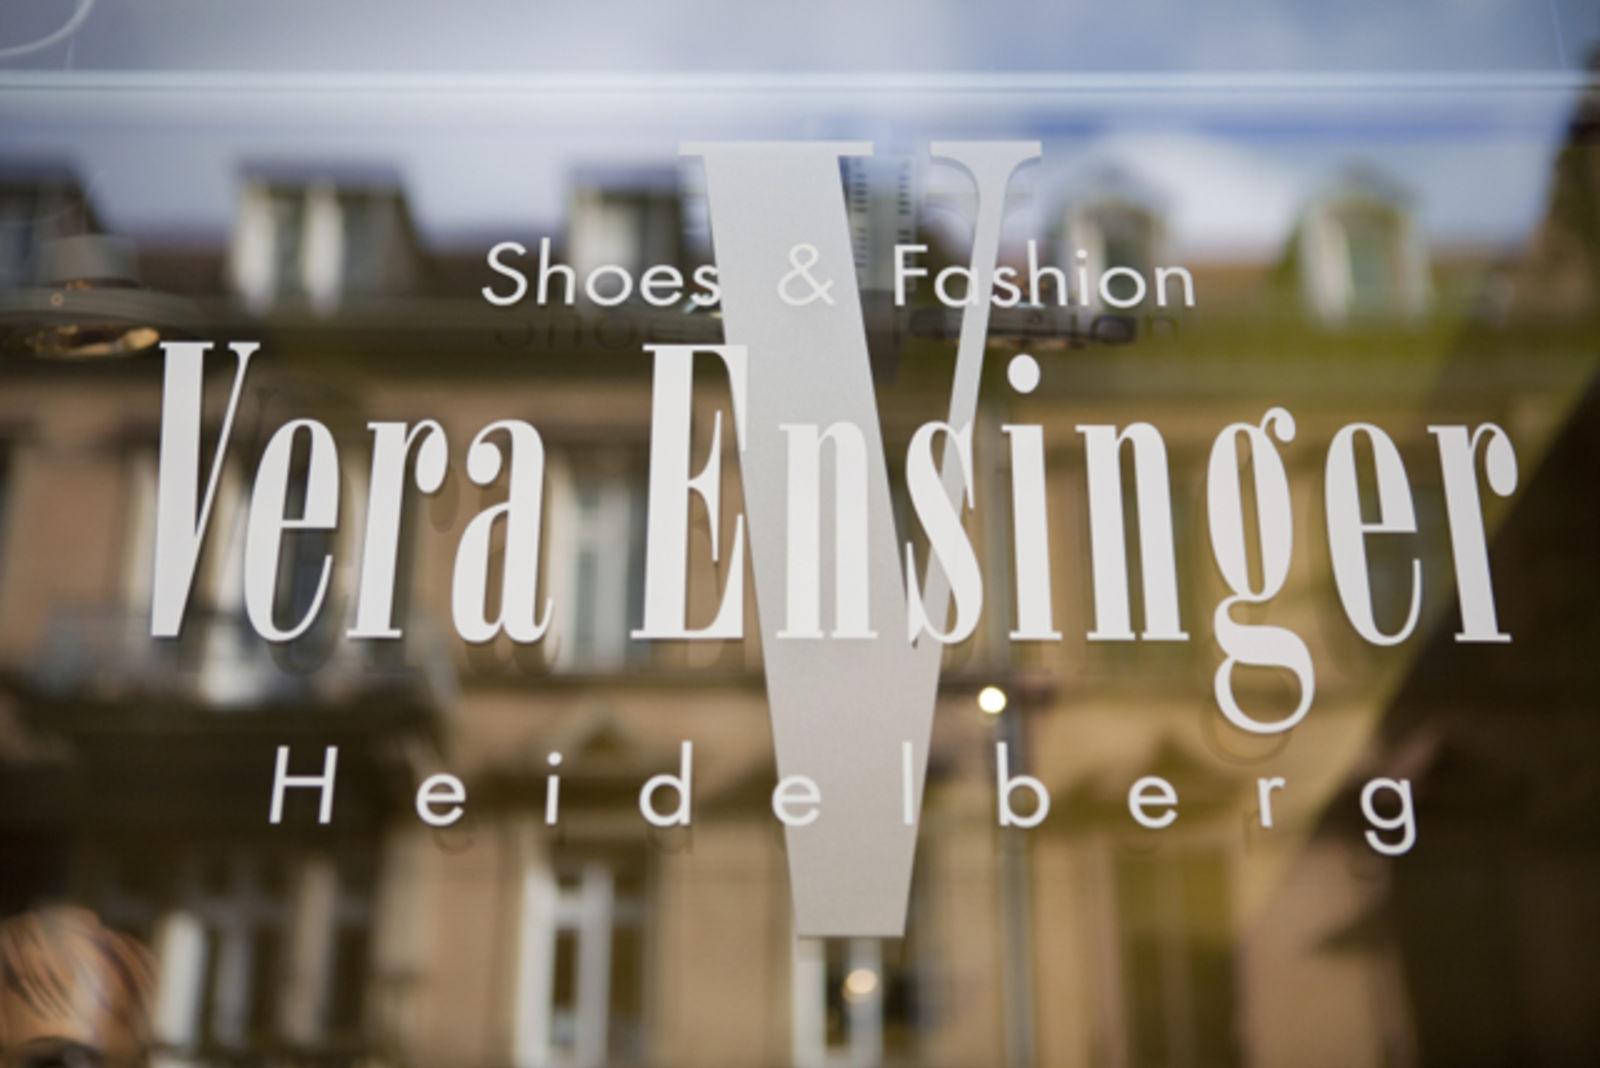 Vera Ensinger Shoes & Fashion in Heidelberg (Bild 1)